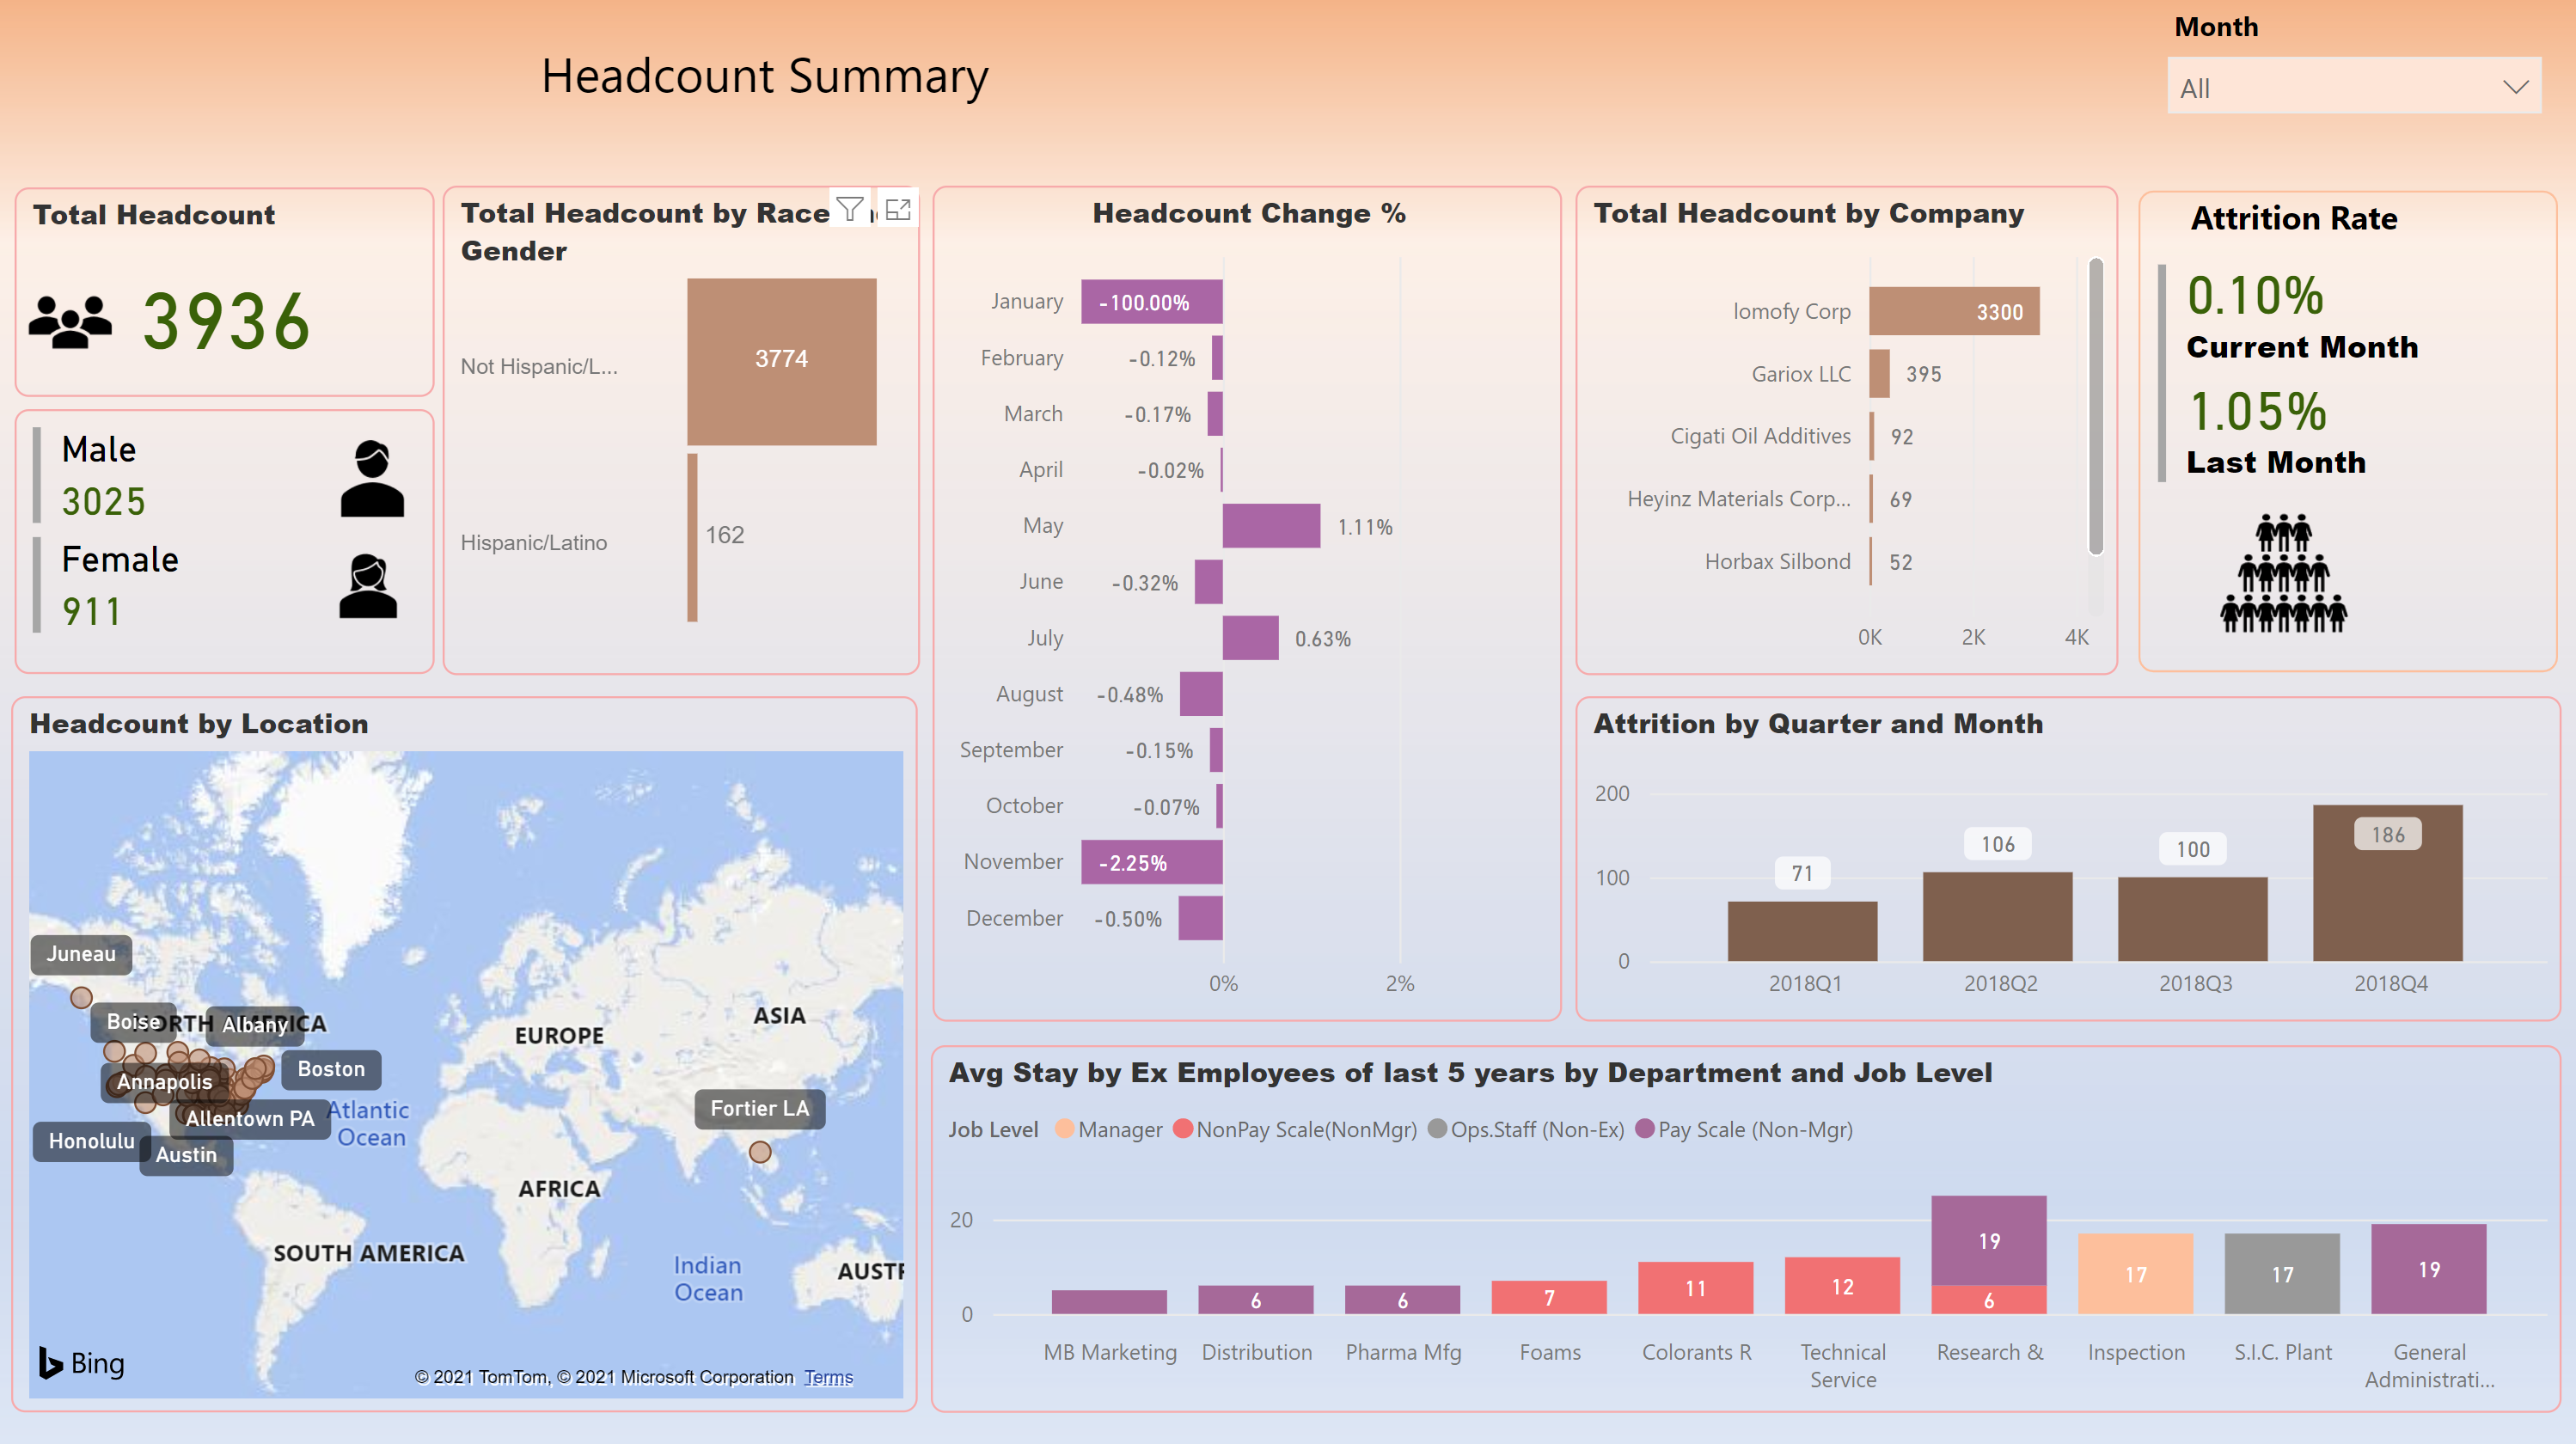 vnb-powerbi-hr-analytics-headcount-summary